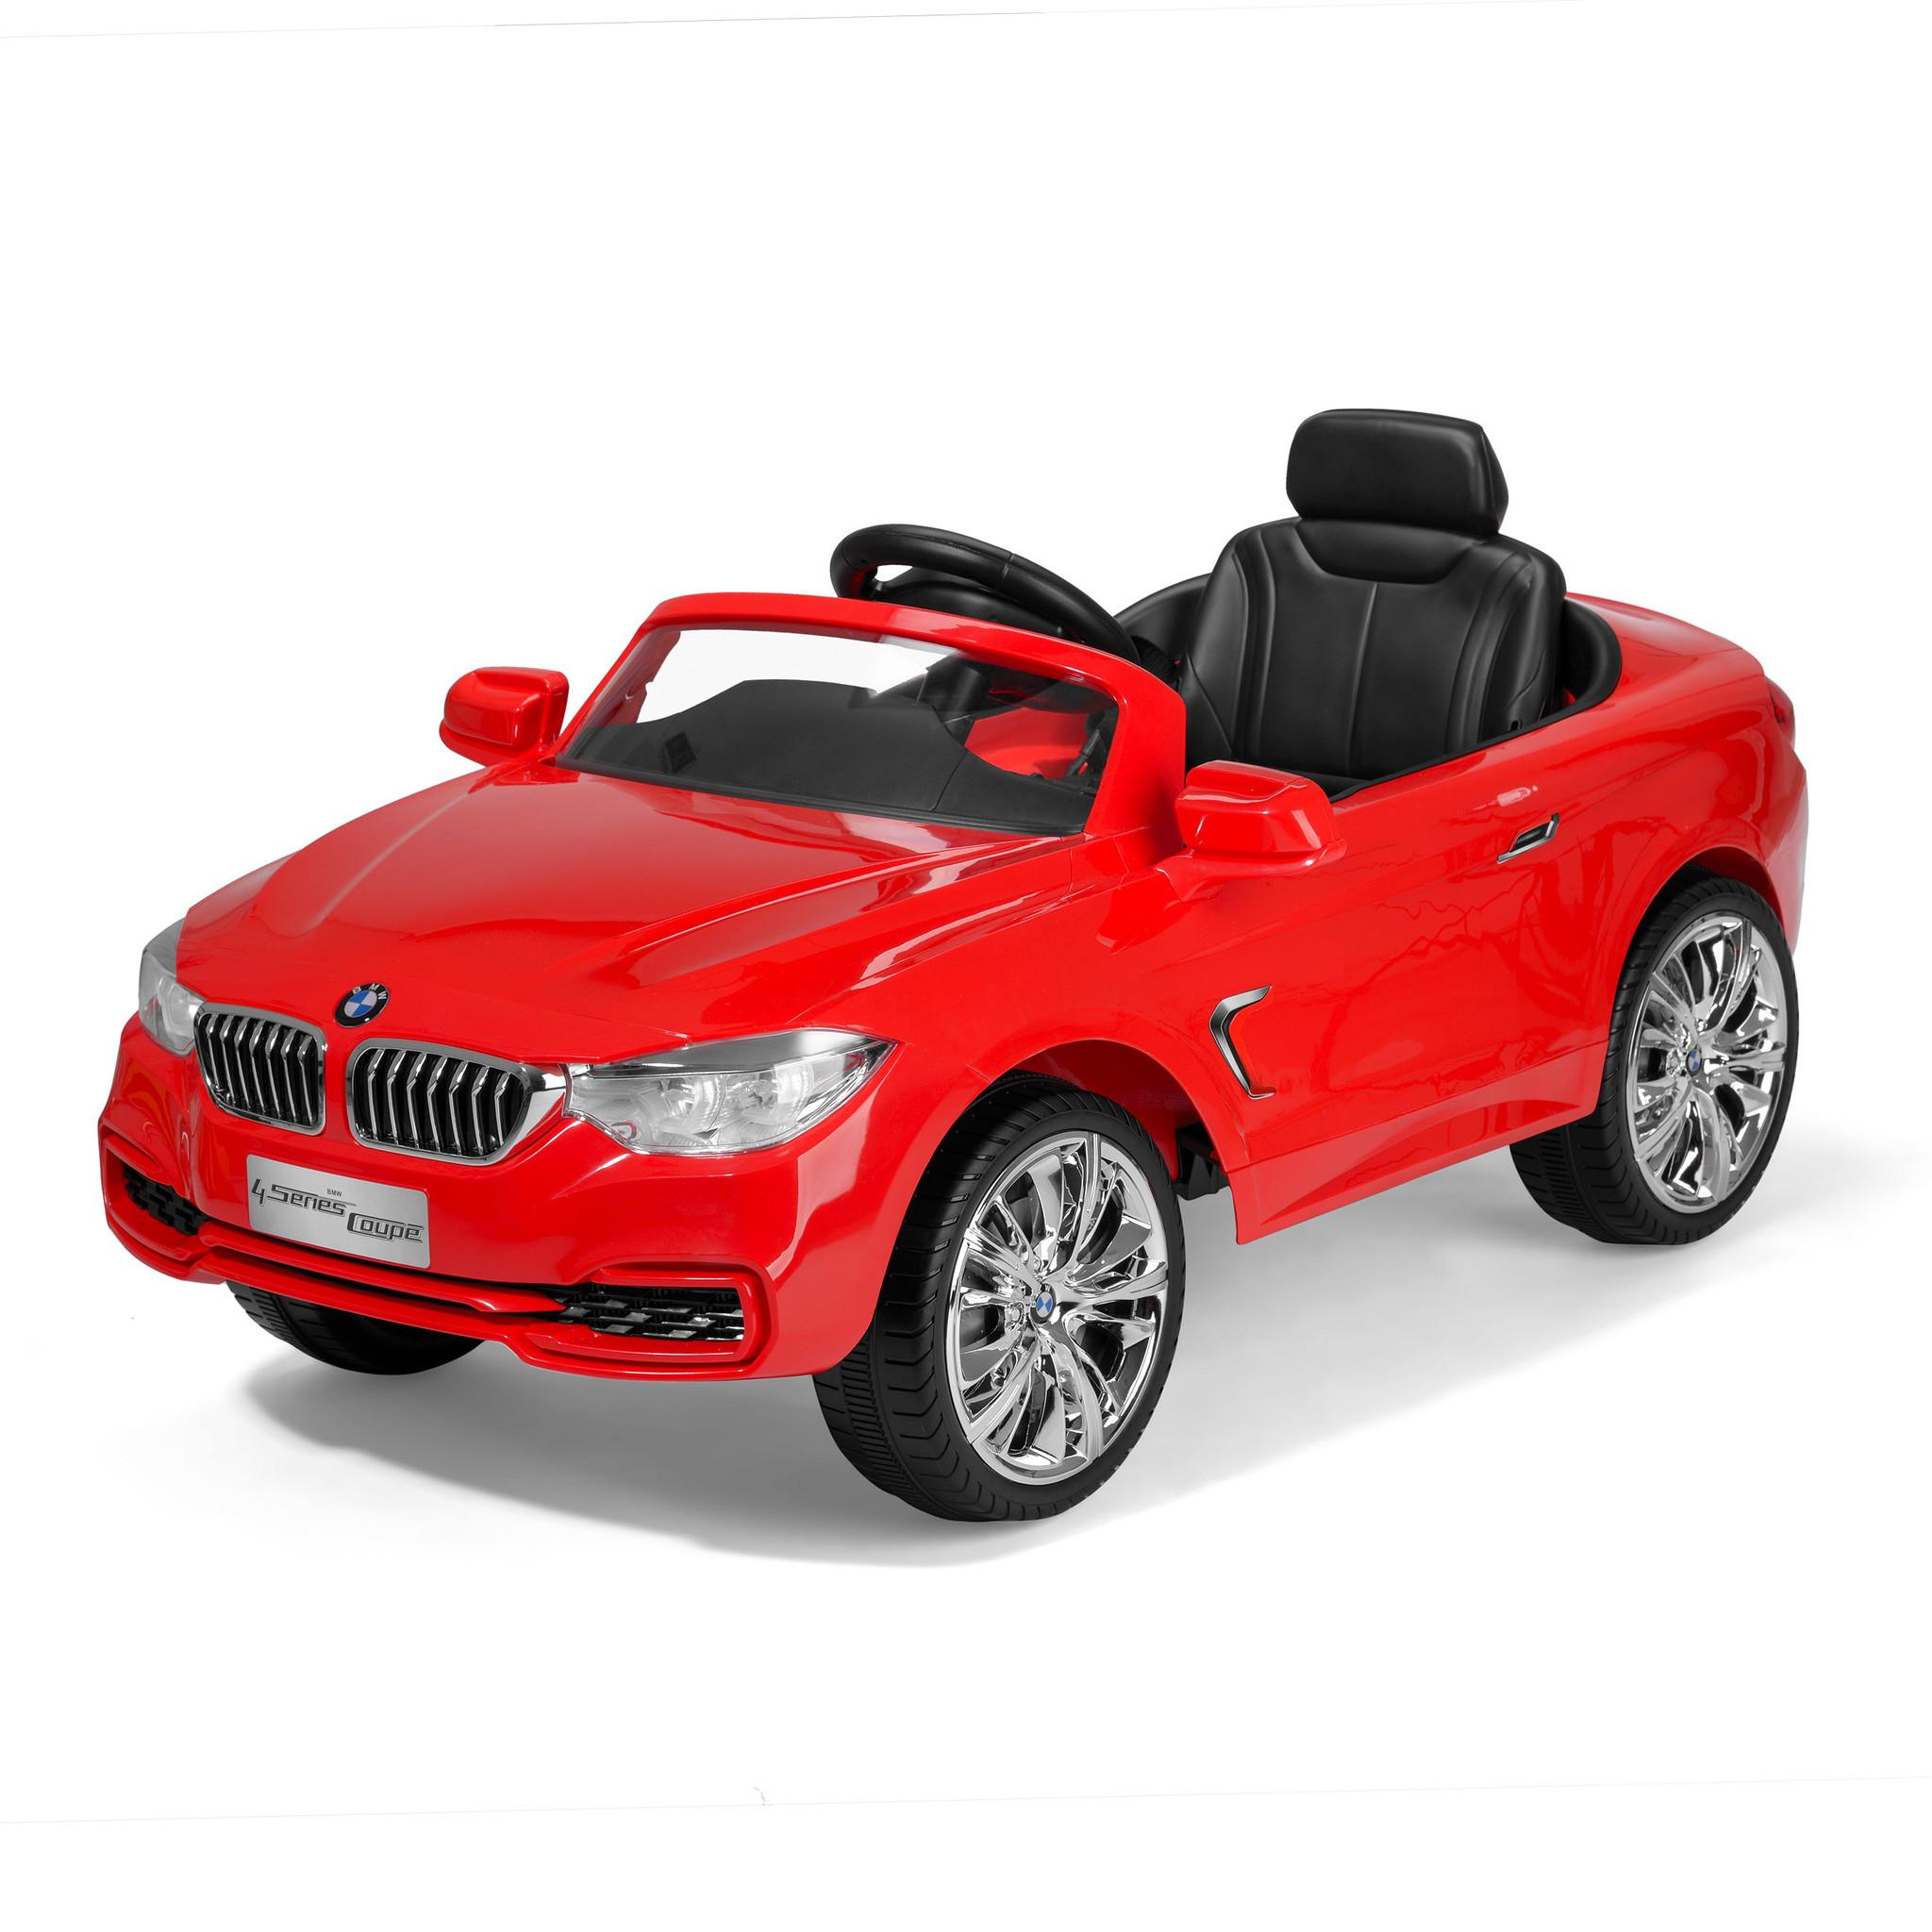 VROOM BMW 4 SERIE ELECTRISCHE AUTO, 6V